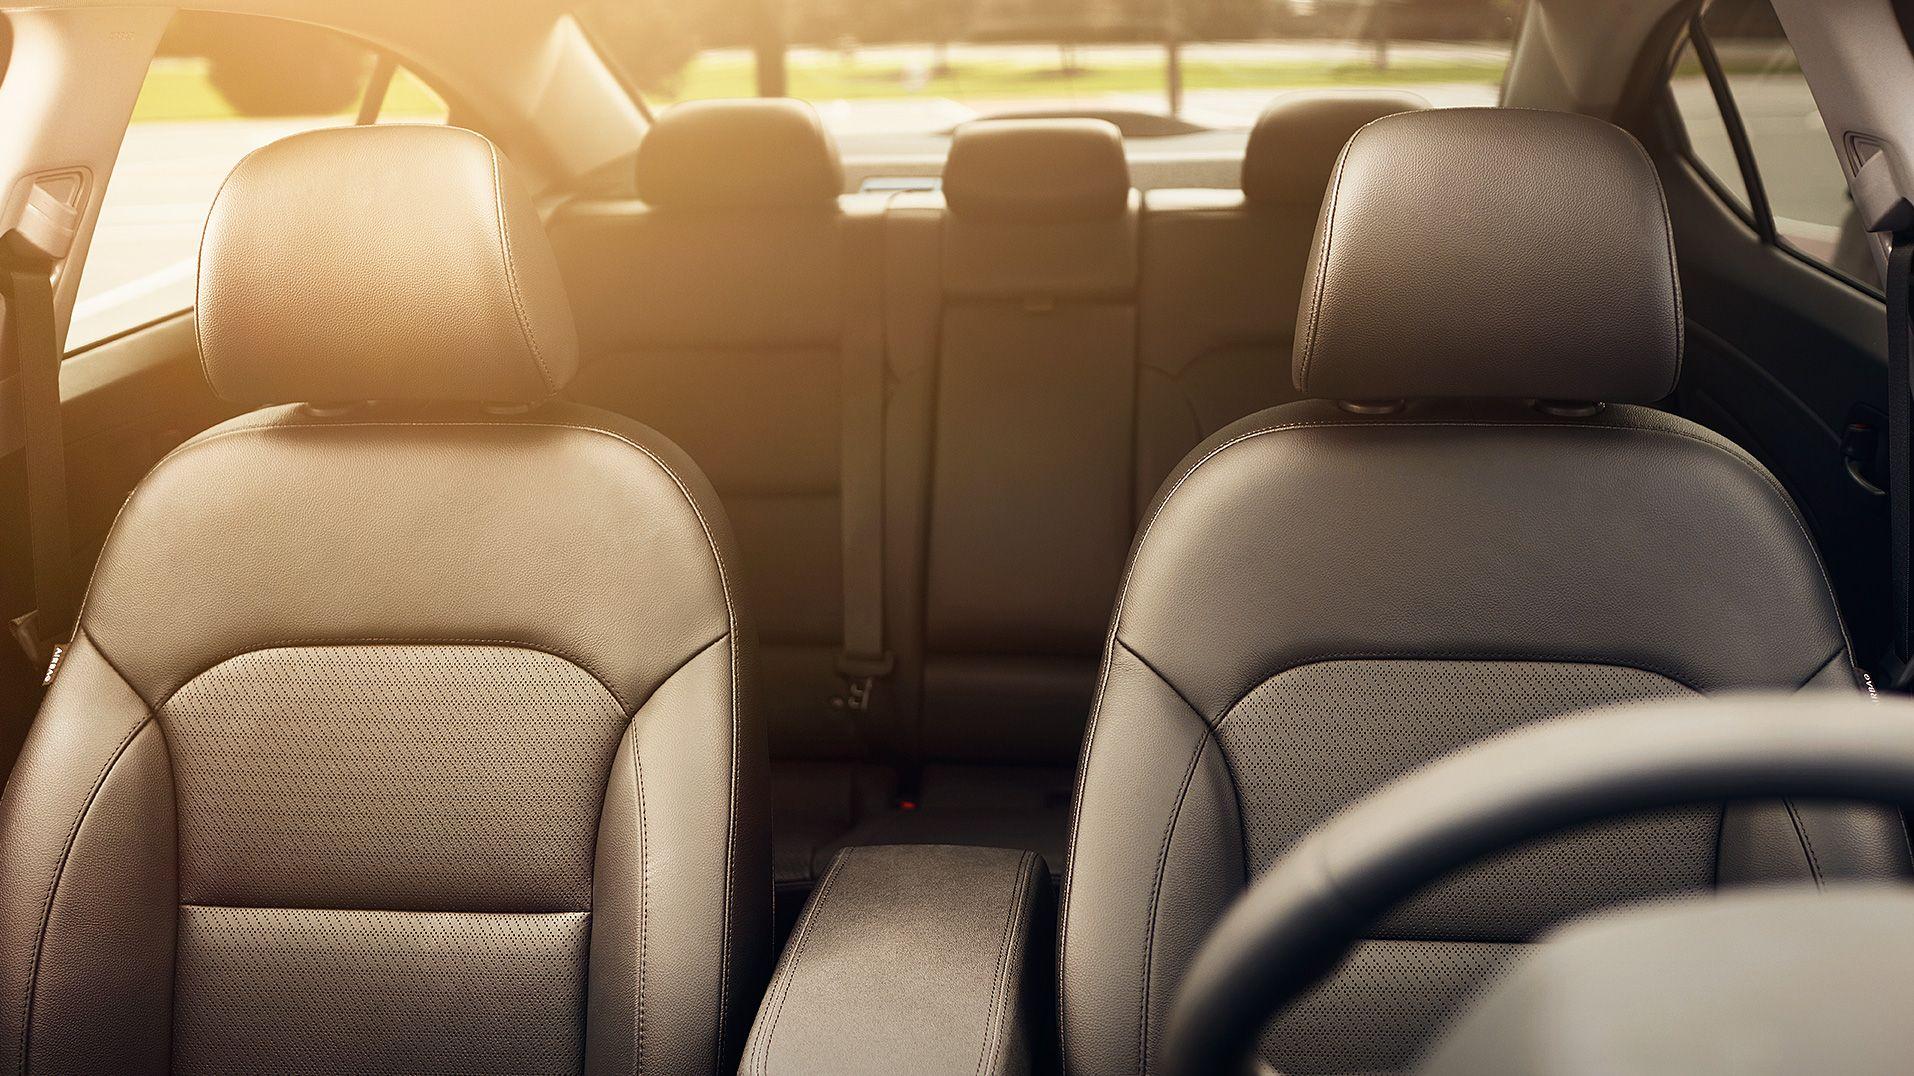 com best once review buick lx compact pin salisbury md car the price ge honda carenara again civic